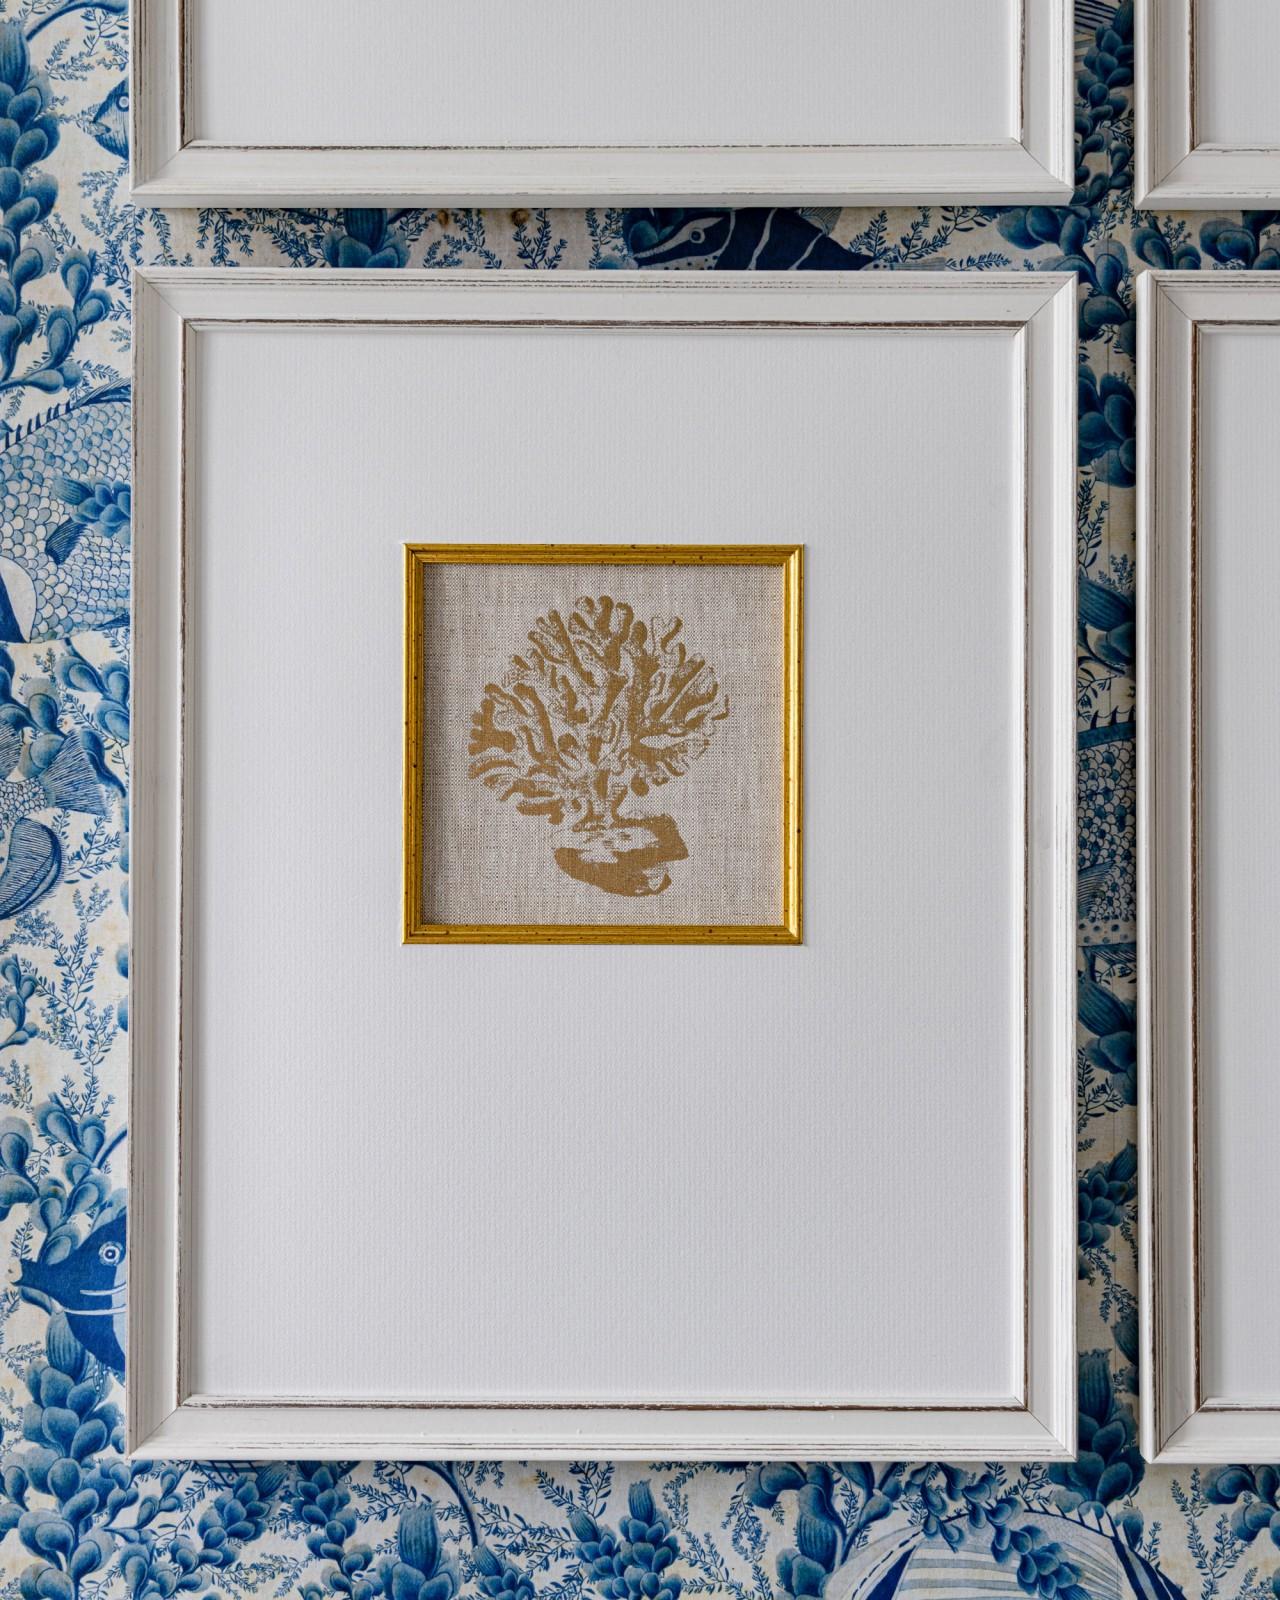 MEDITERRANEAN GEMS - CORAL Framed Linen